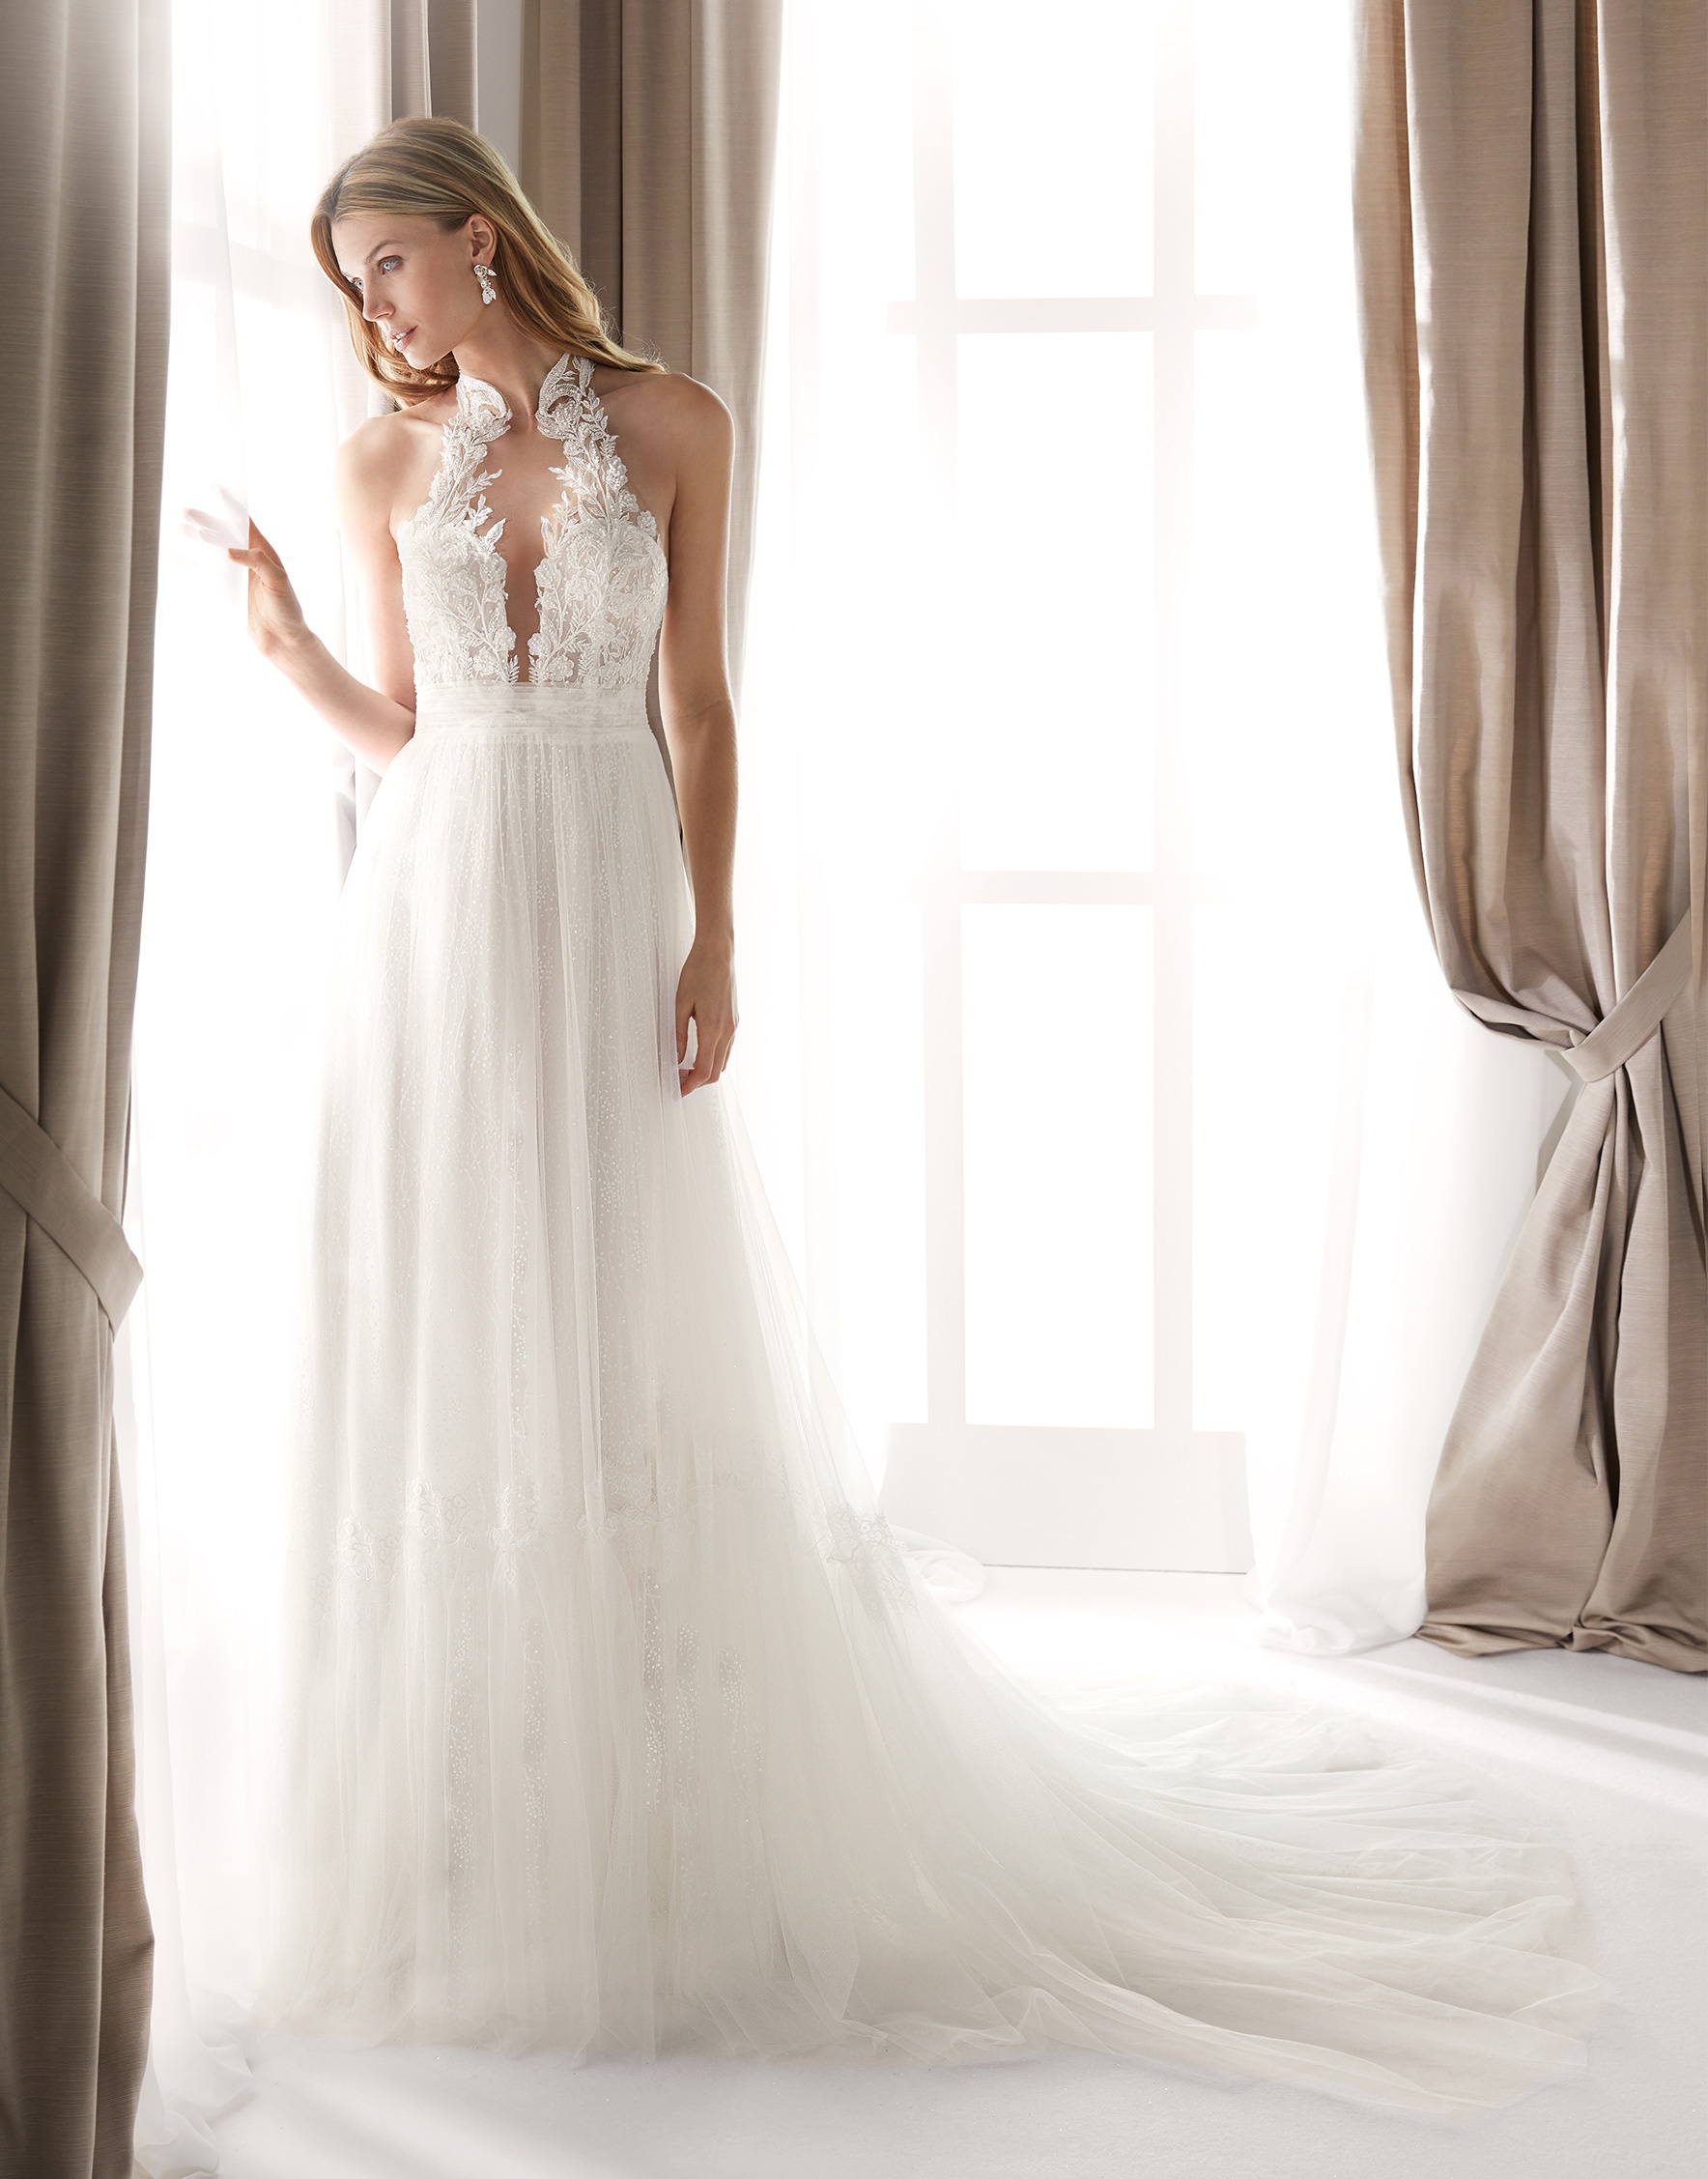 nicole-spose-NIA20421-Nicole-moda-sposa-2020-450